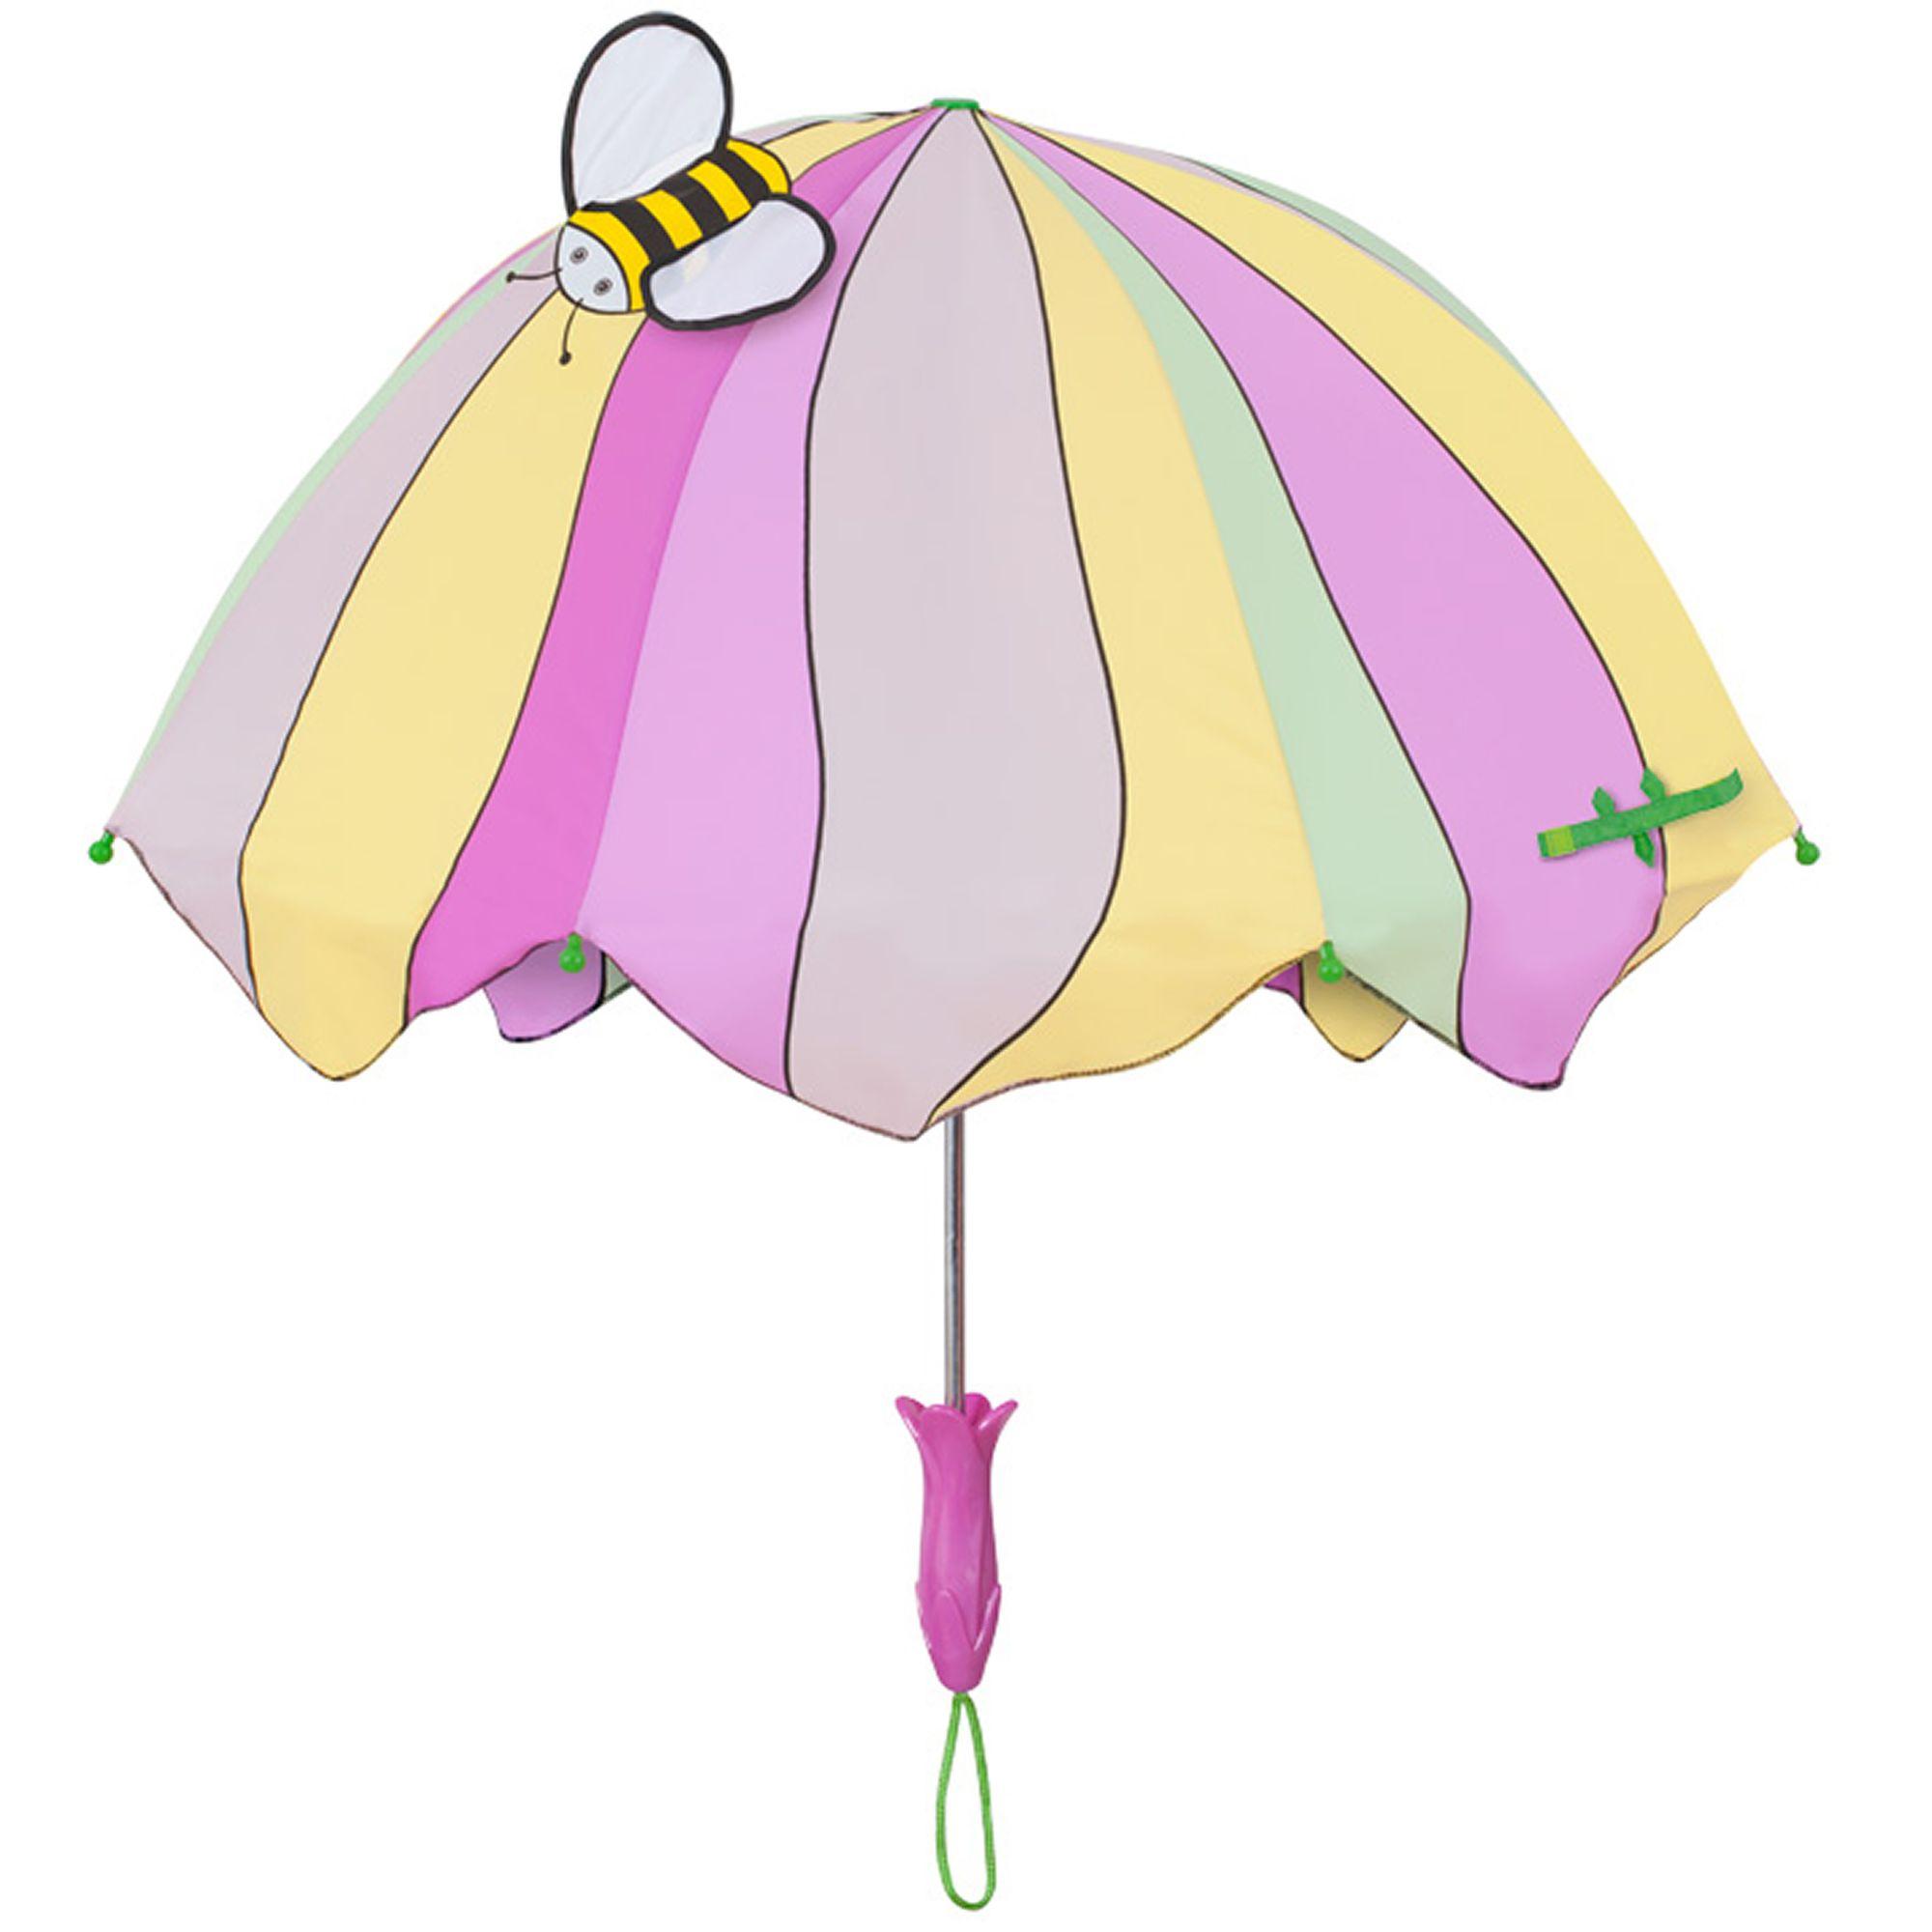 guarda-chuva-flor-de-lotus-kidorable